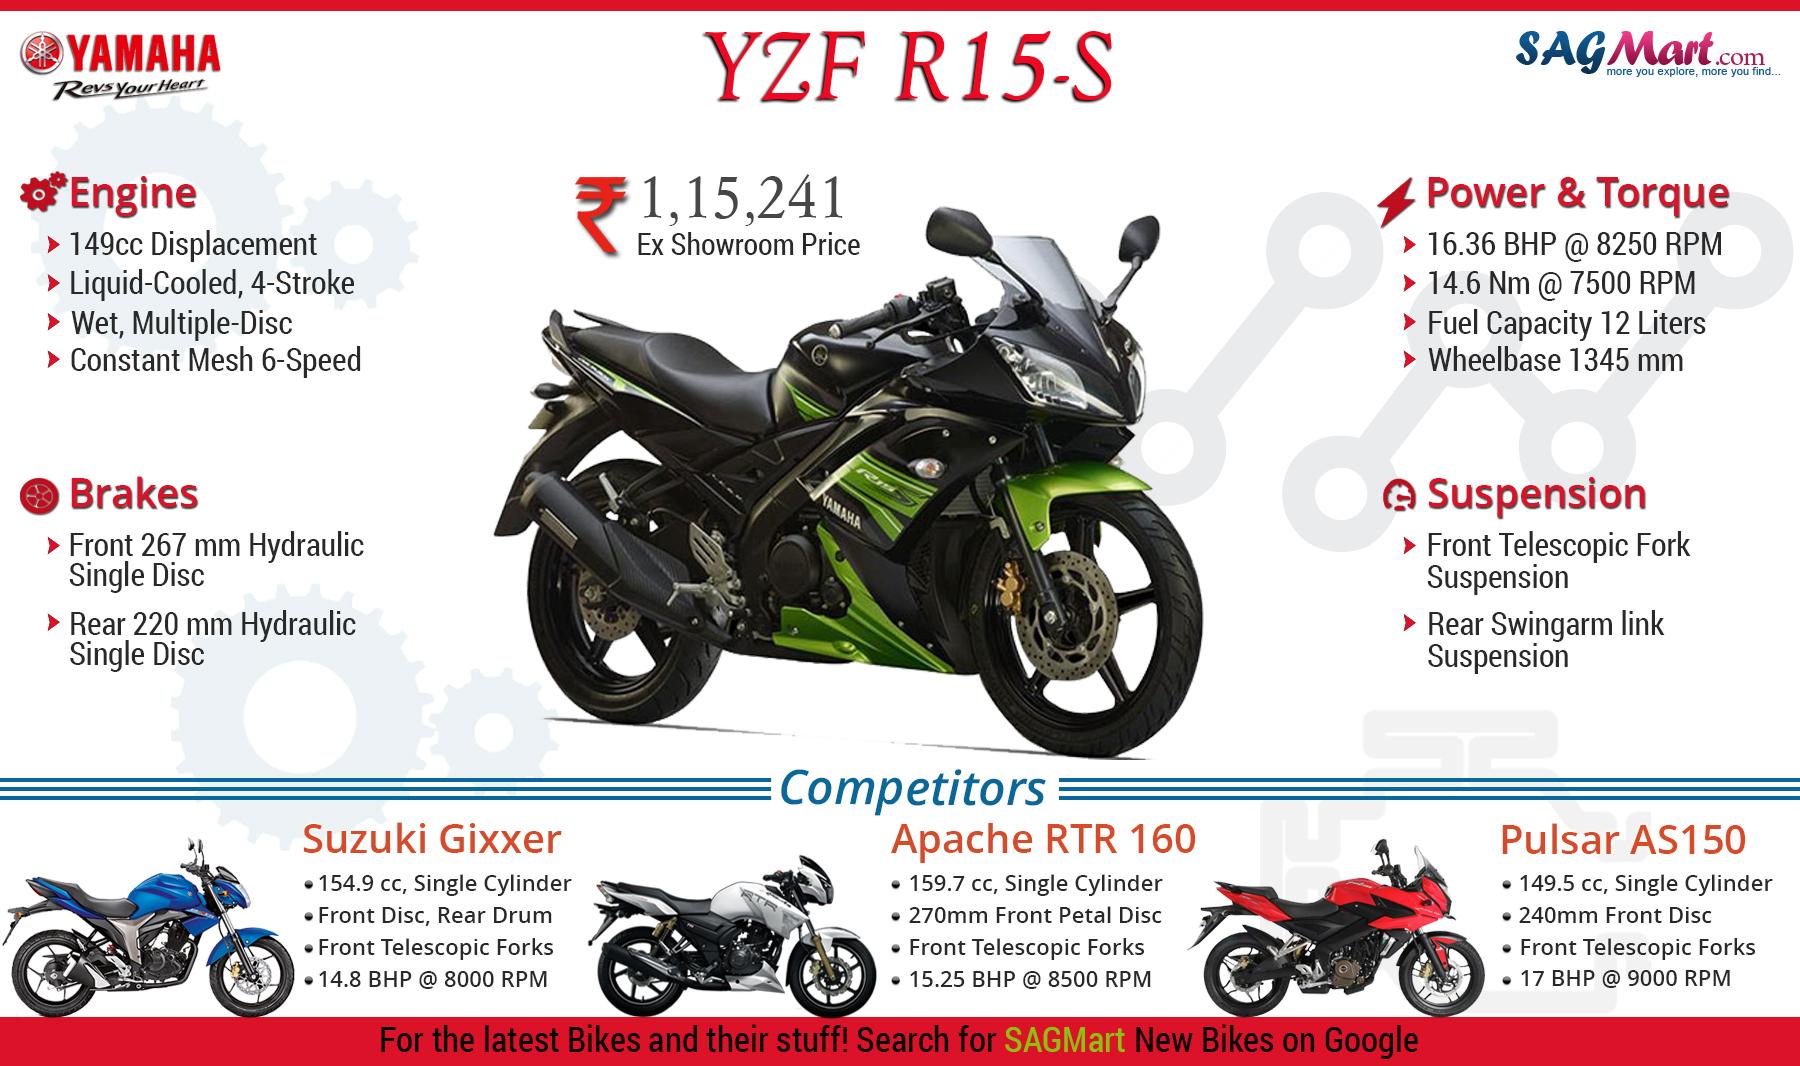 yamaha r15s price in bangalore dating